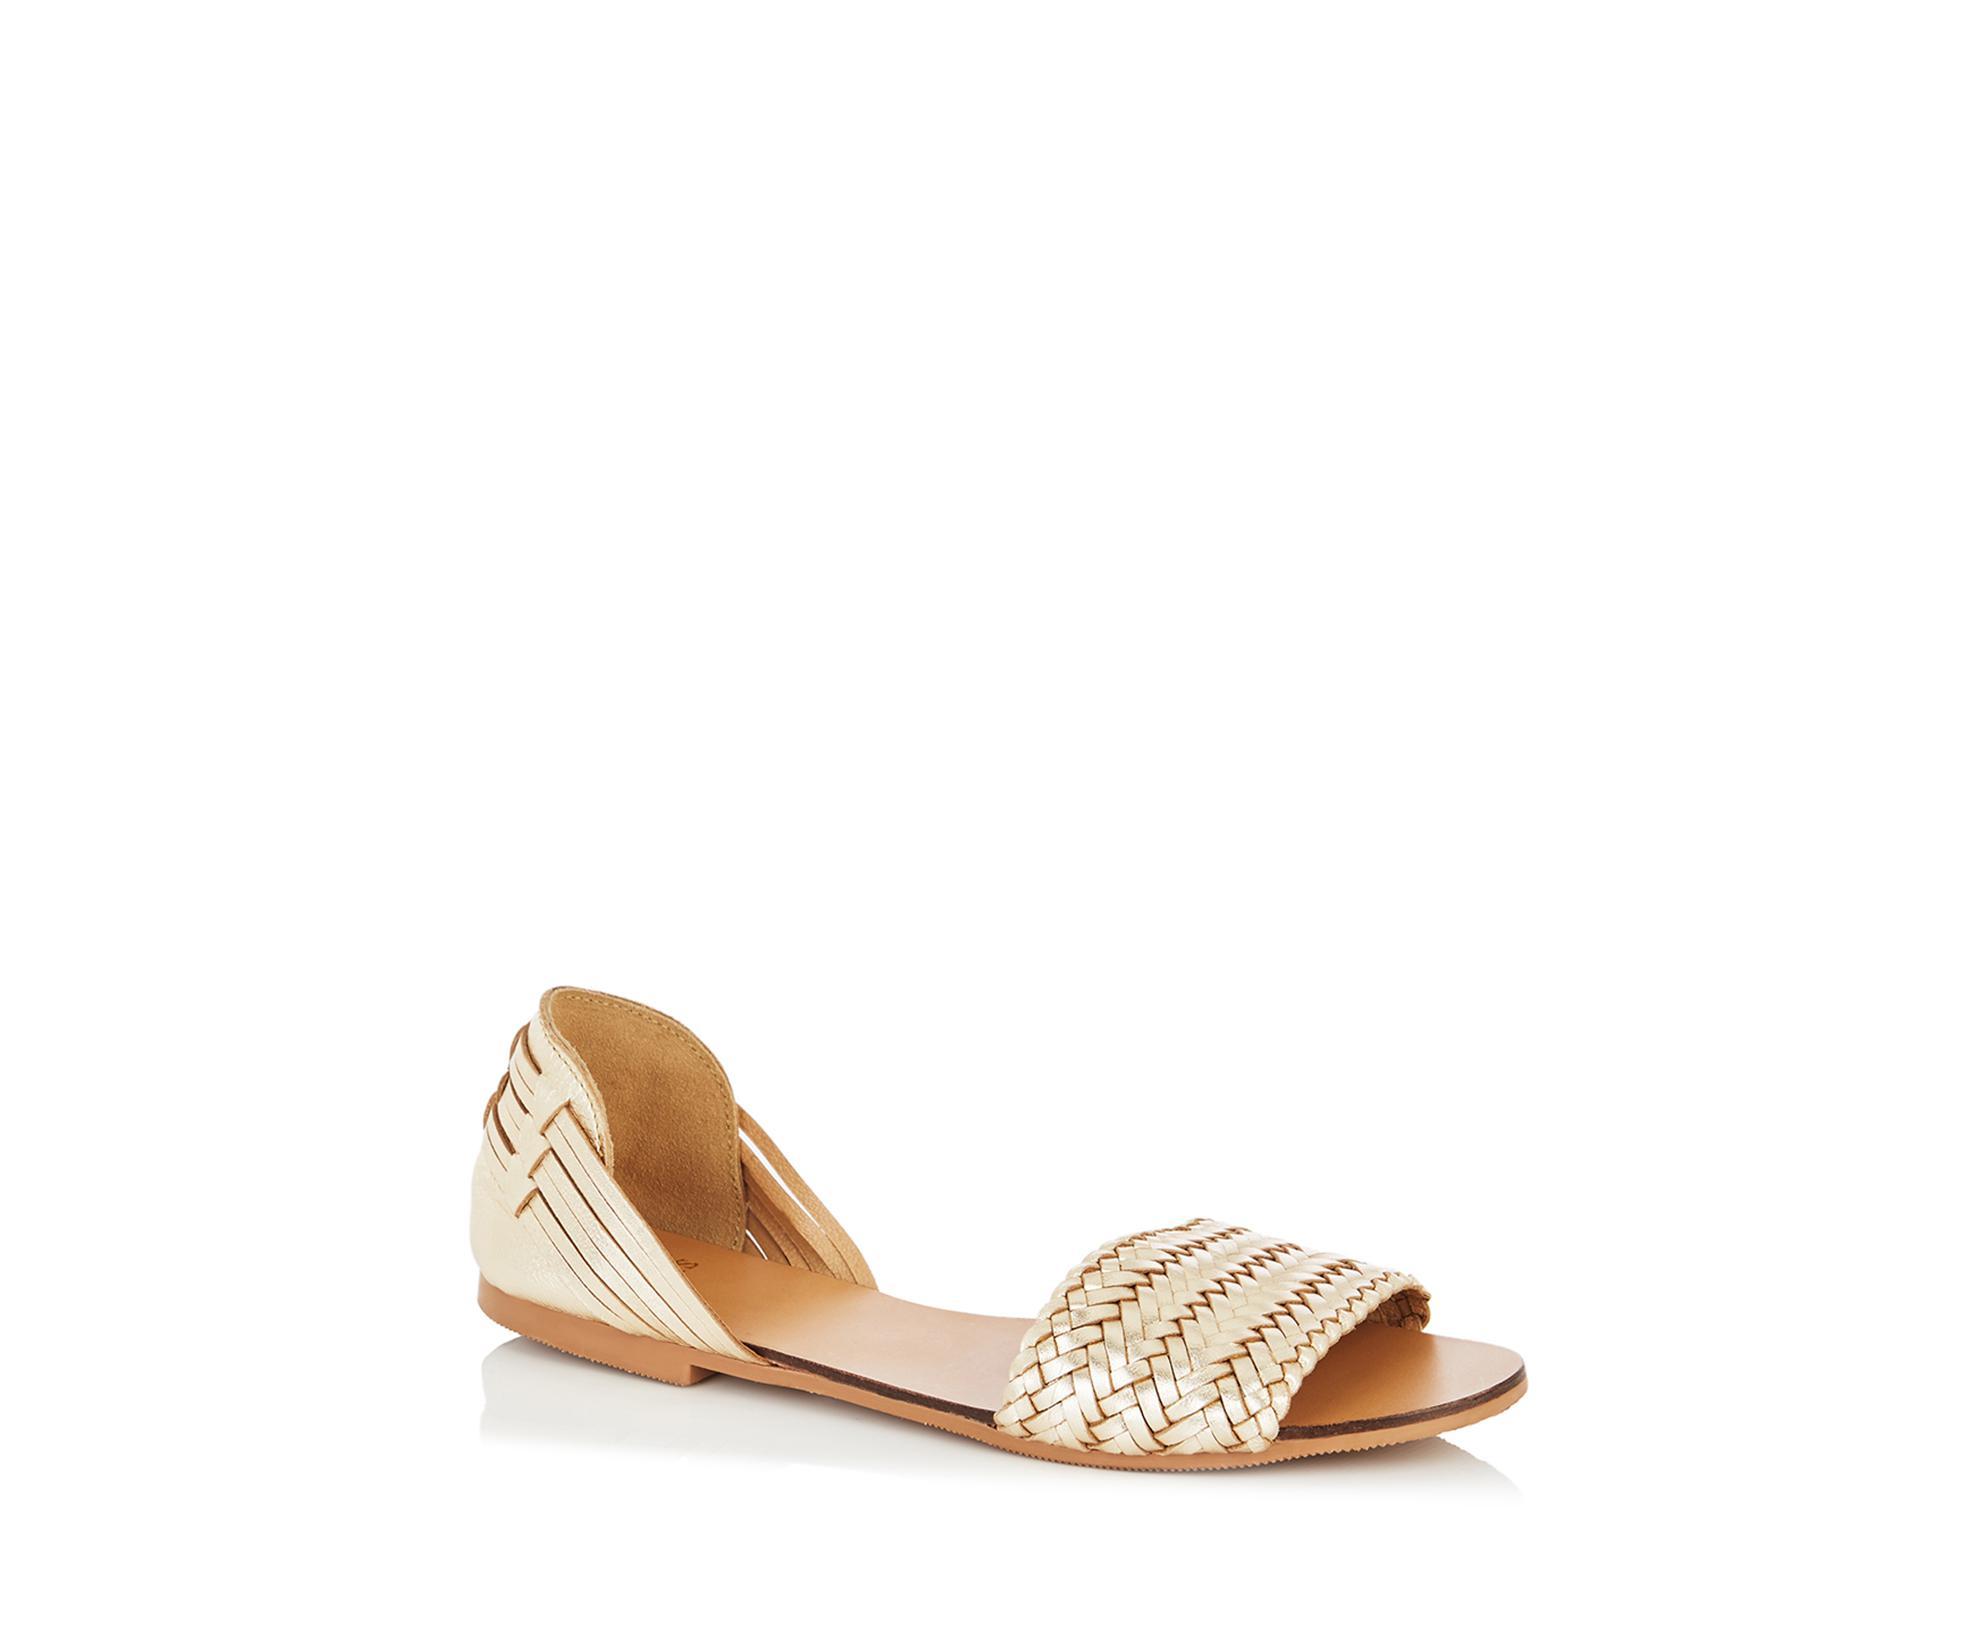 a967e958454d Oasis Hope Huarache Sandals in Metallic - Lyst